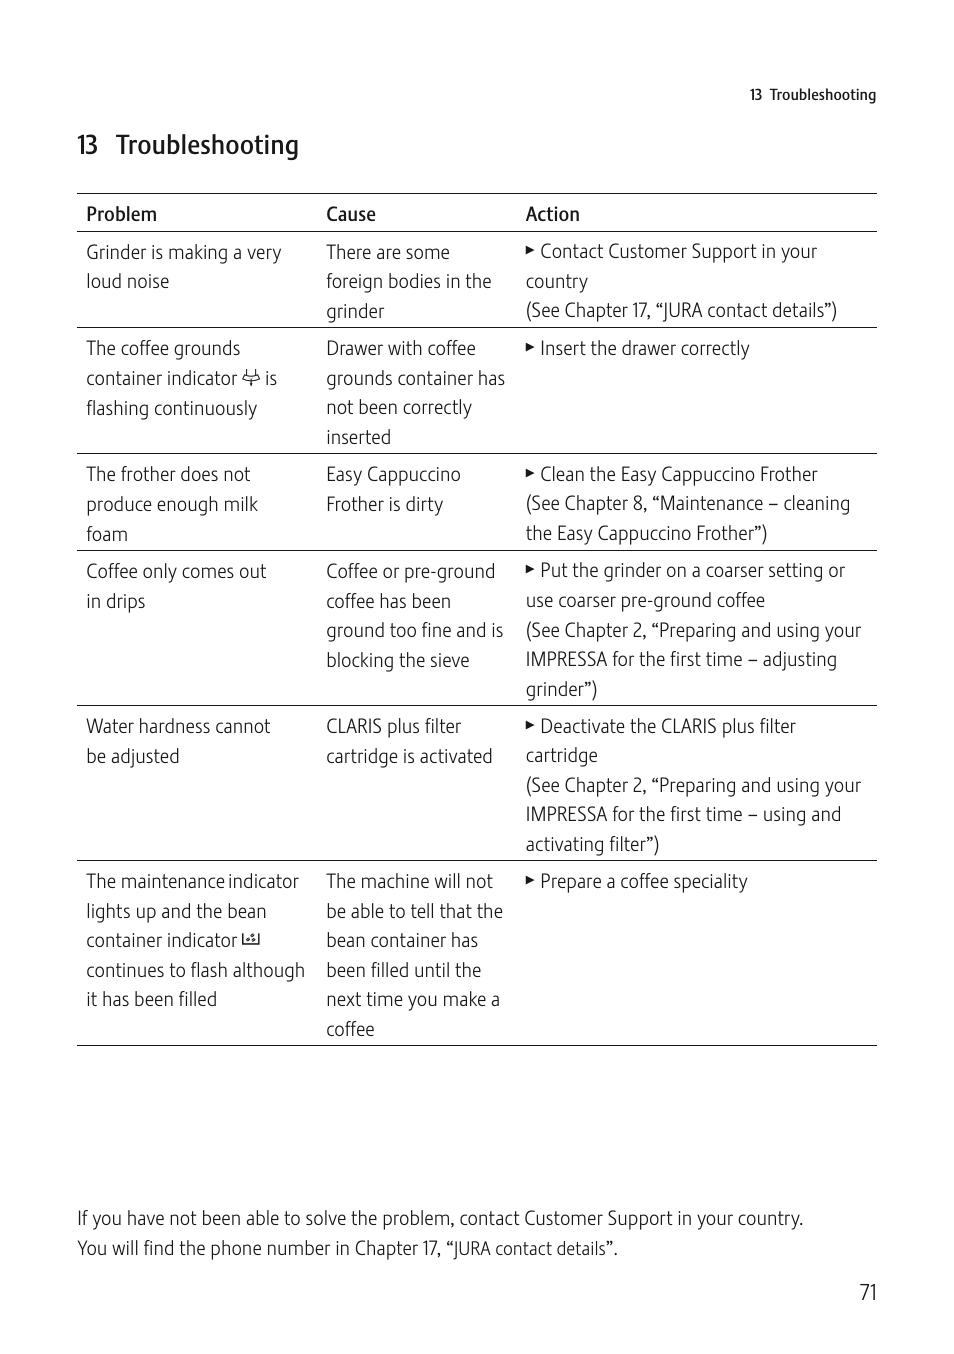 13 troubleshooting   Jura Capresso IMPRESSA C5 User Manual   Page 71 / 88